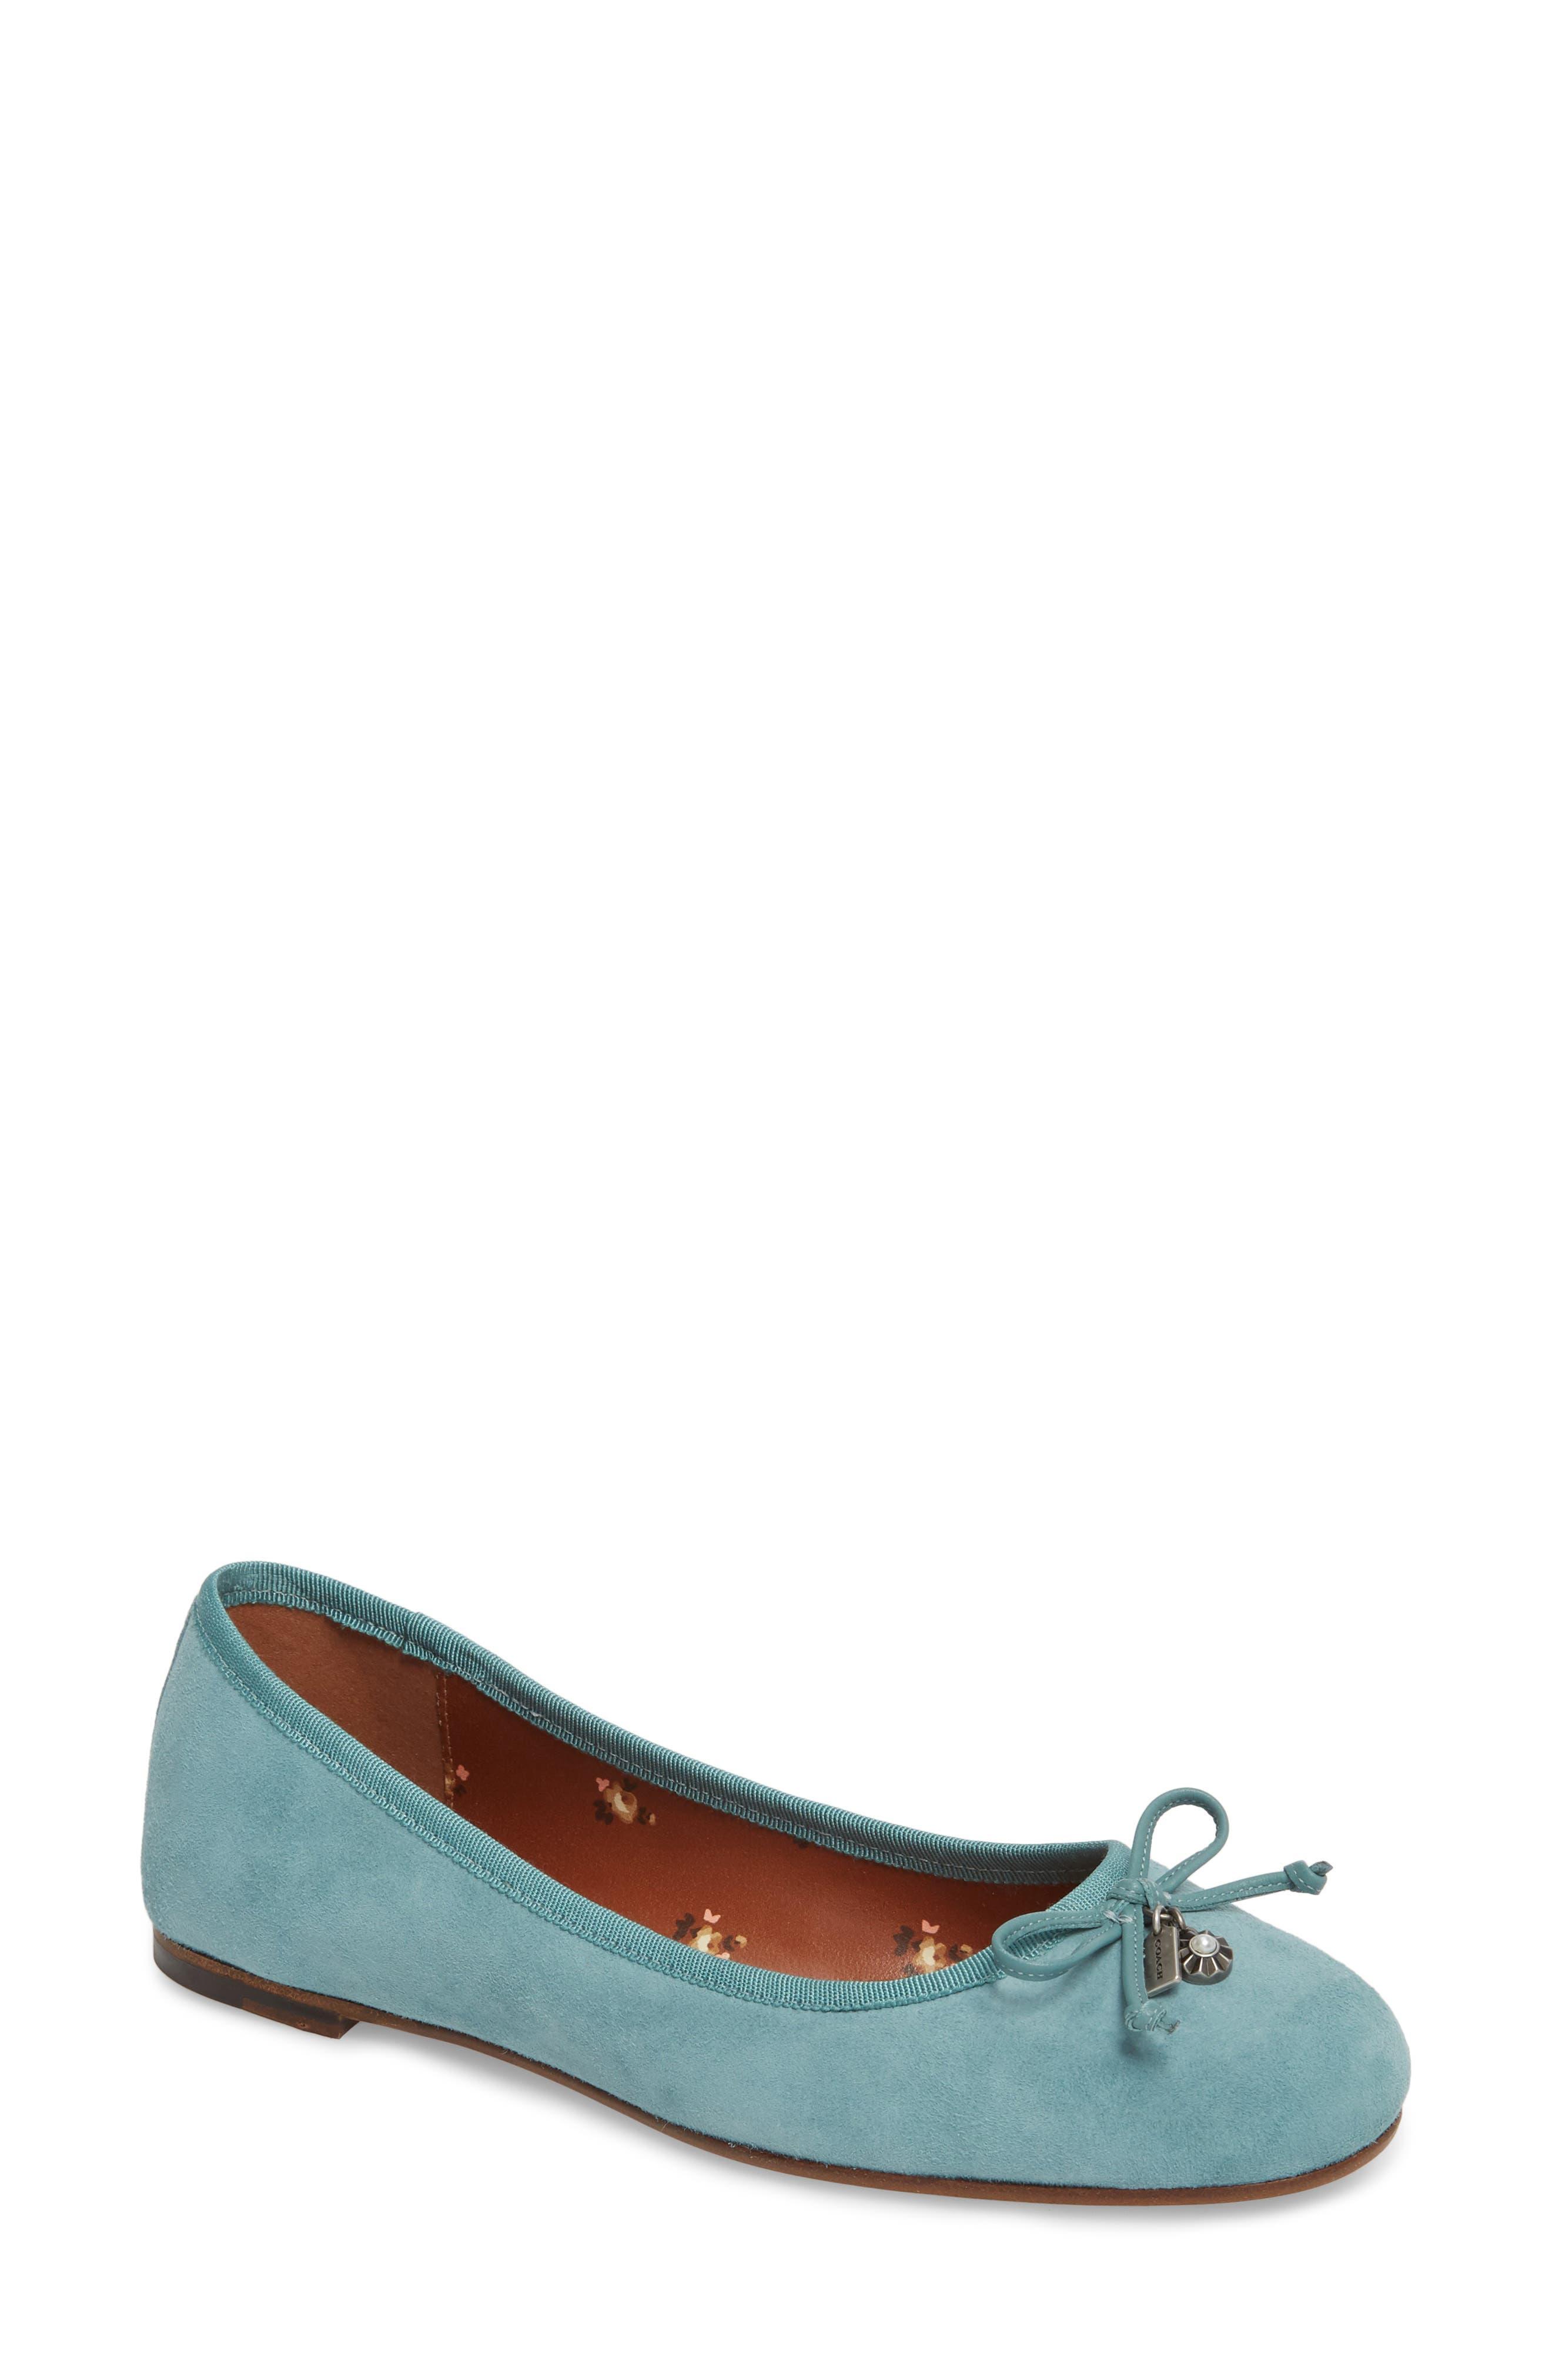 Lola Ballet Flat,                         Main,                         color, Marine Leather